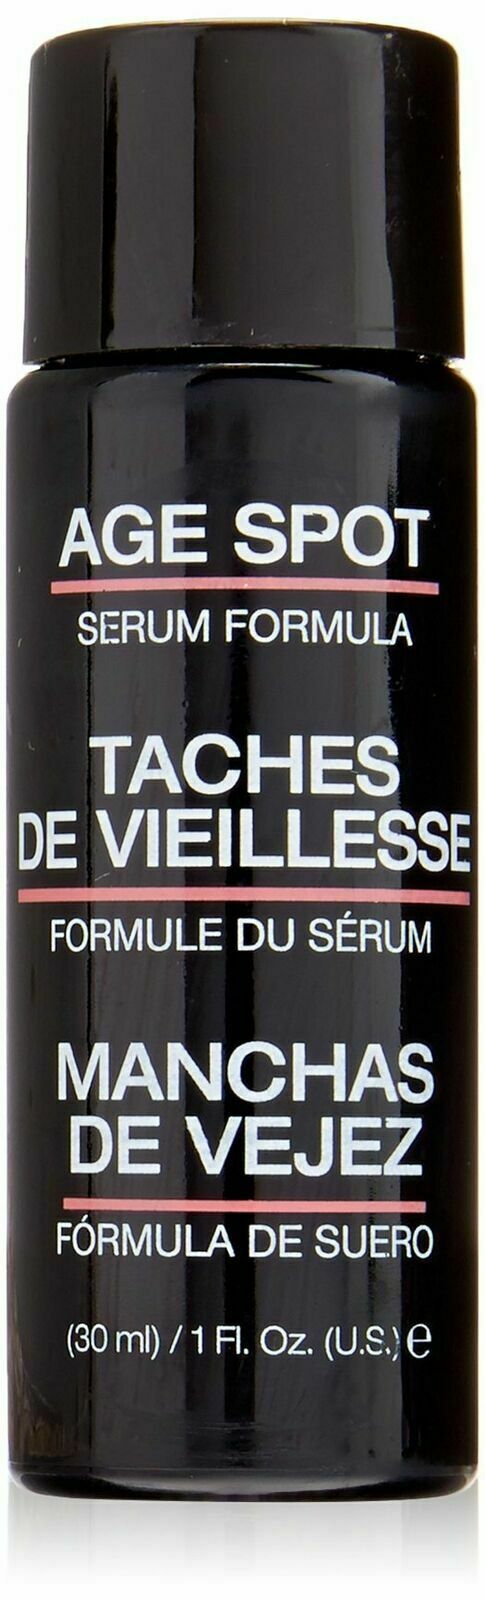 dermactin-ts-age-spot-serum-oz-new